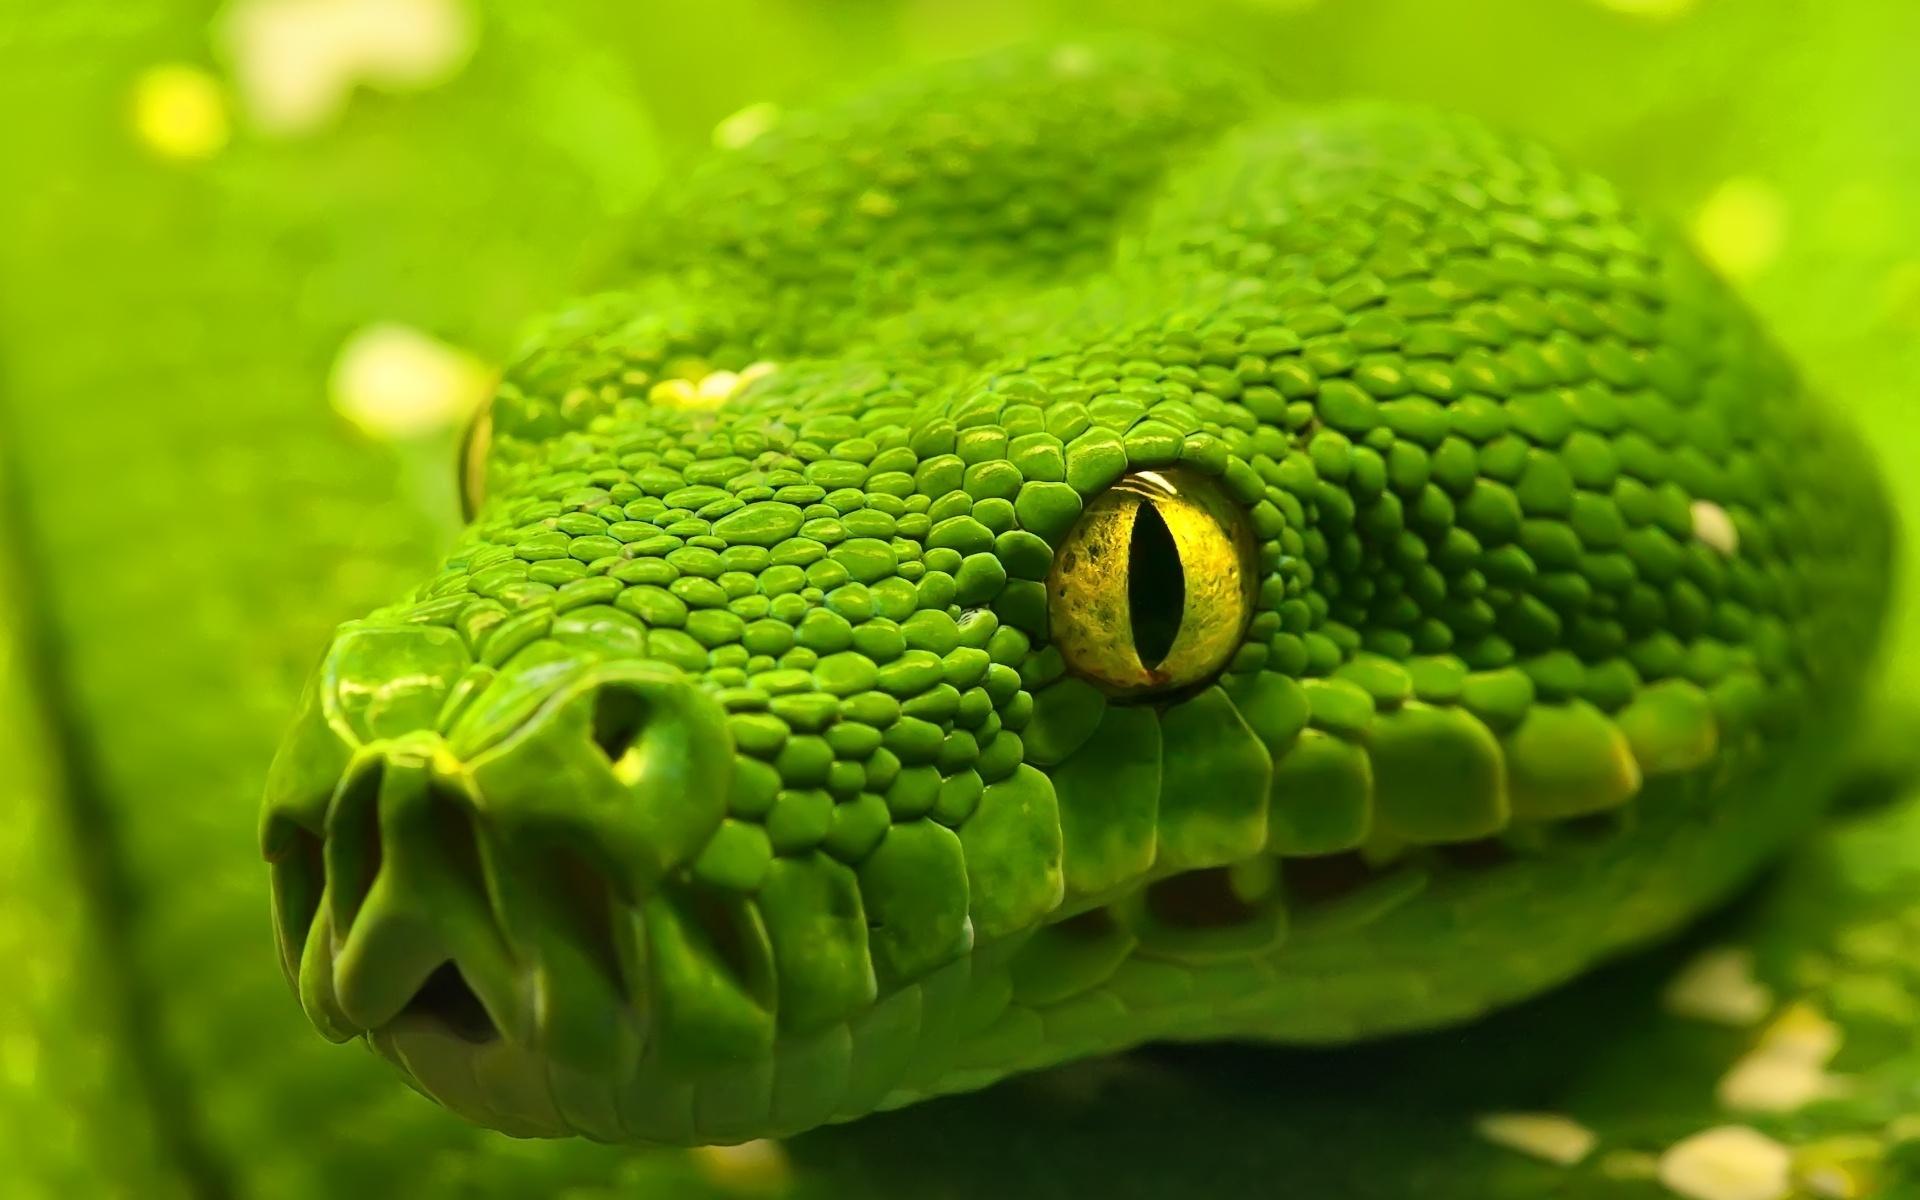 snake wallpaper green anaconda reptile eyes desktop wallpapers a l 1920x1200